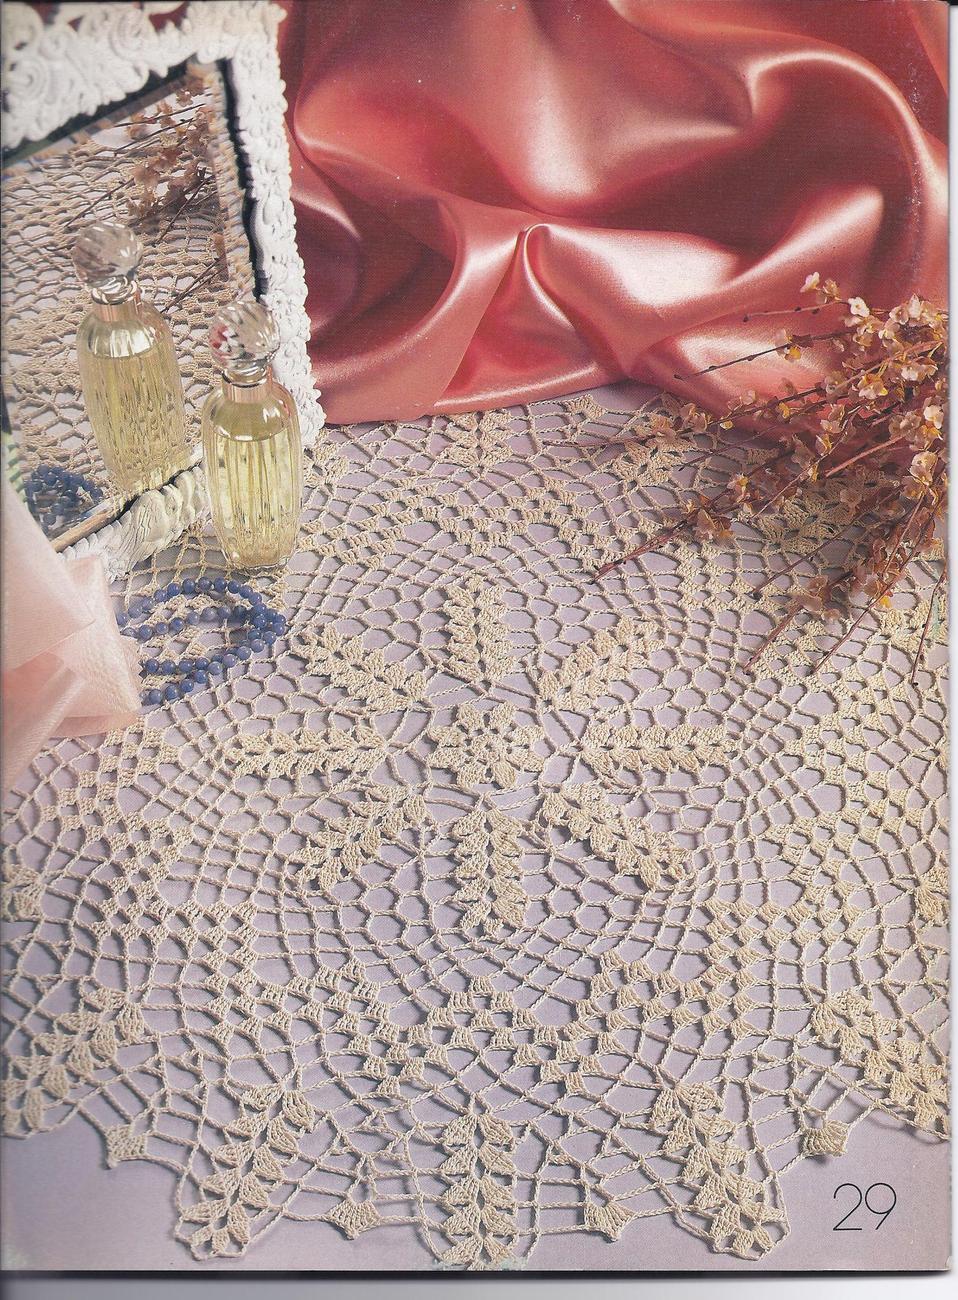 Decorative Crochet Pattern Magazine #16~~29 Patterns